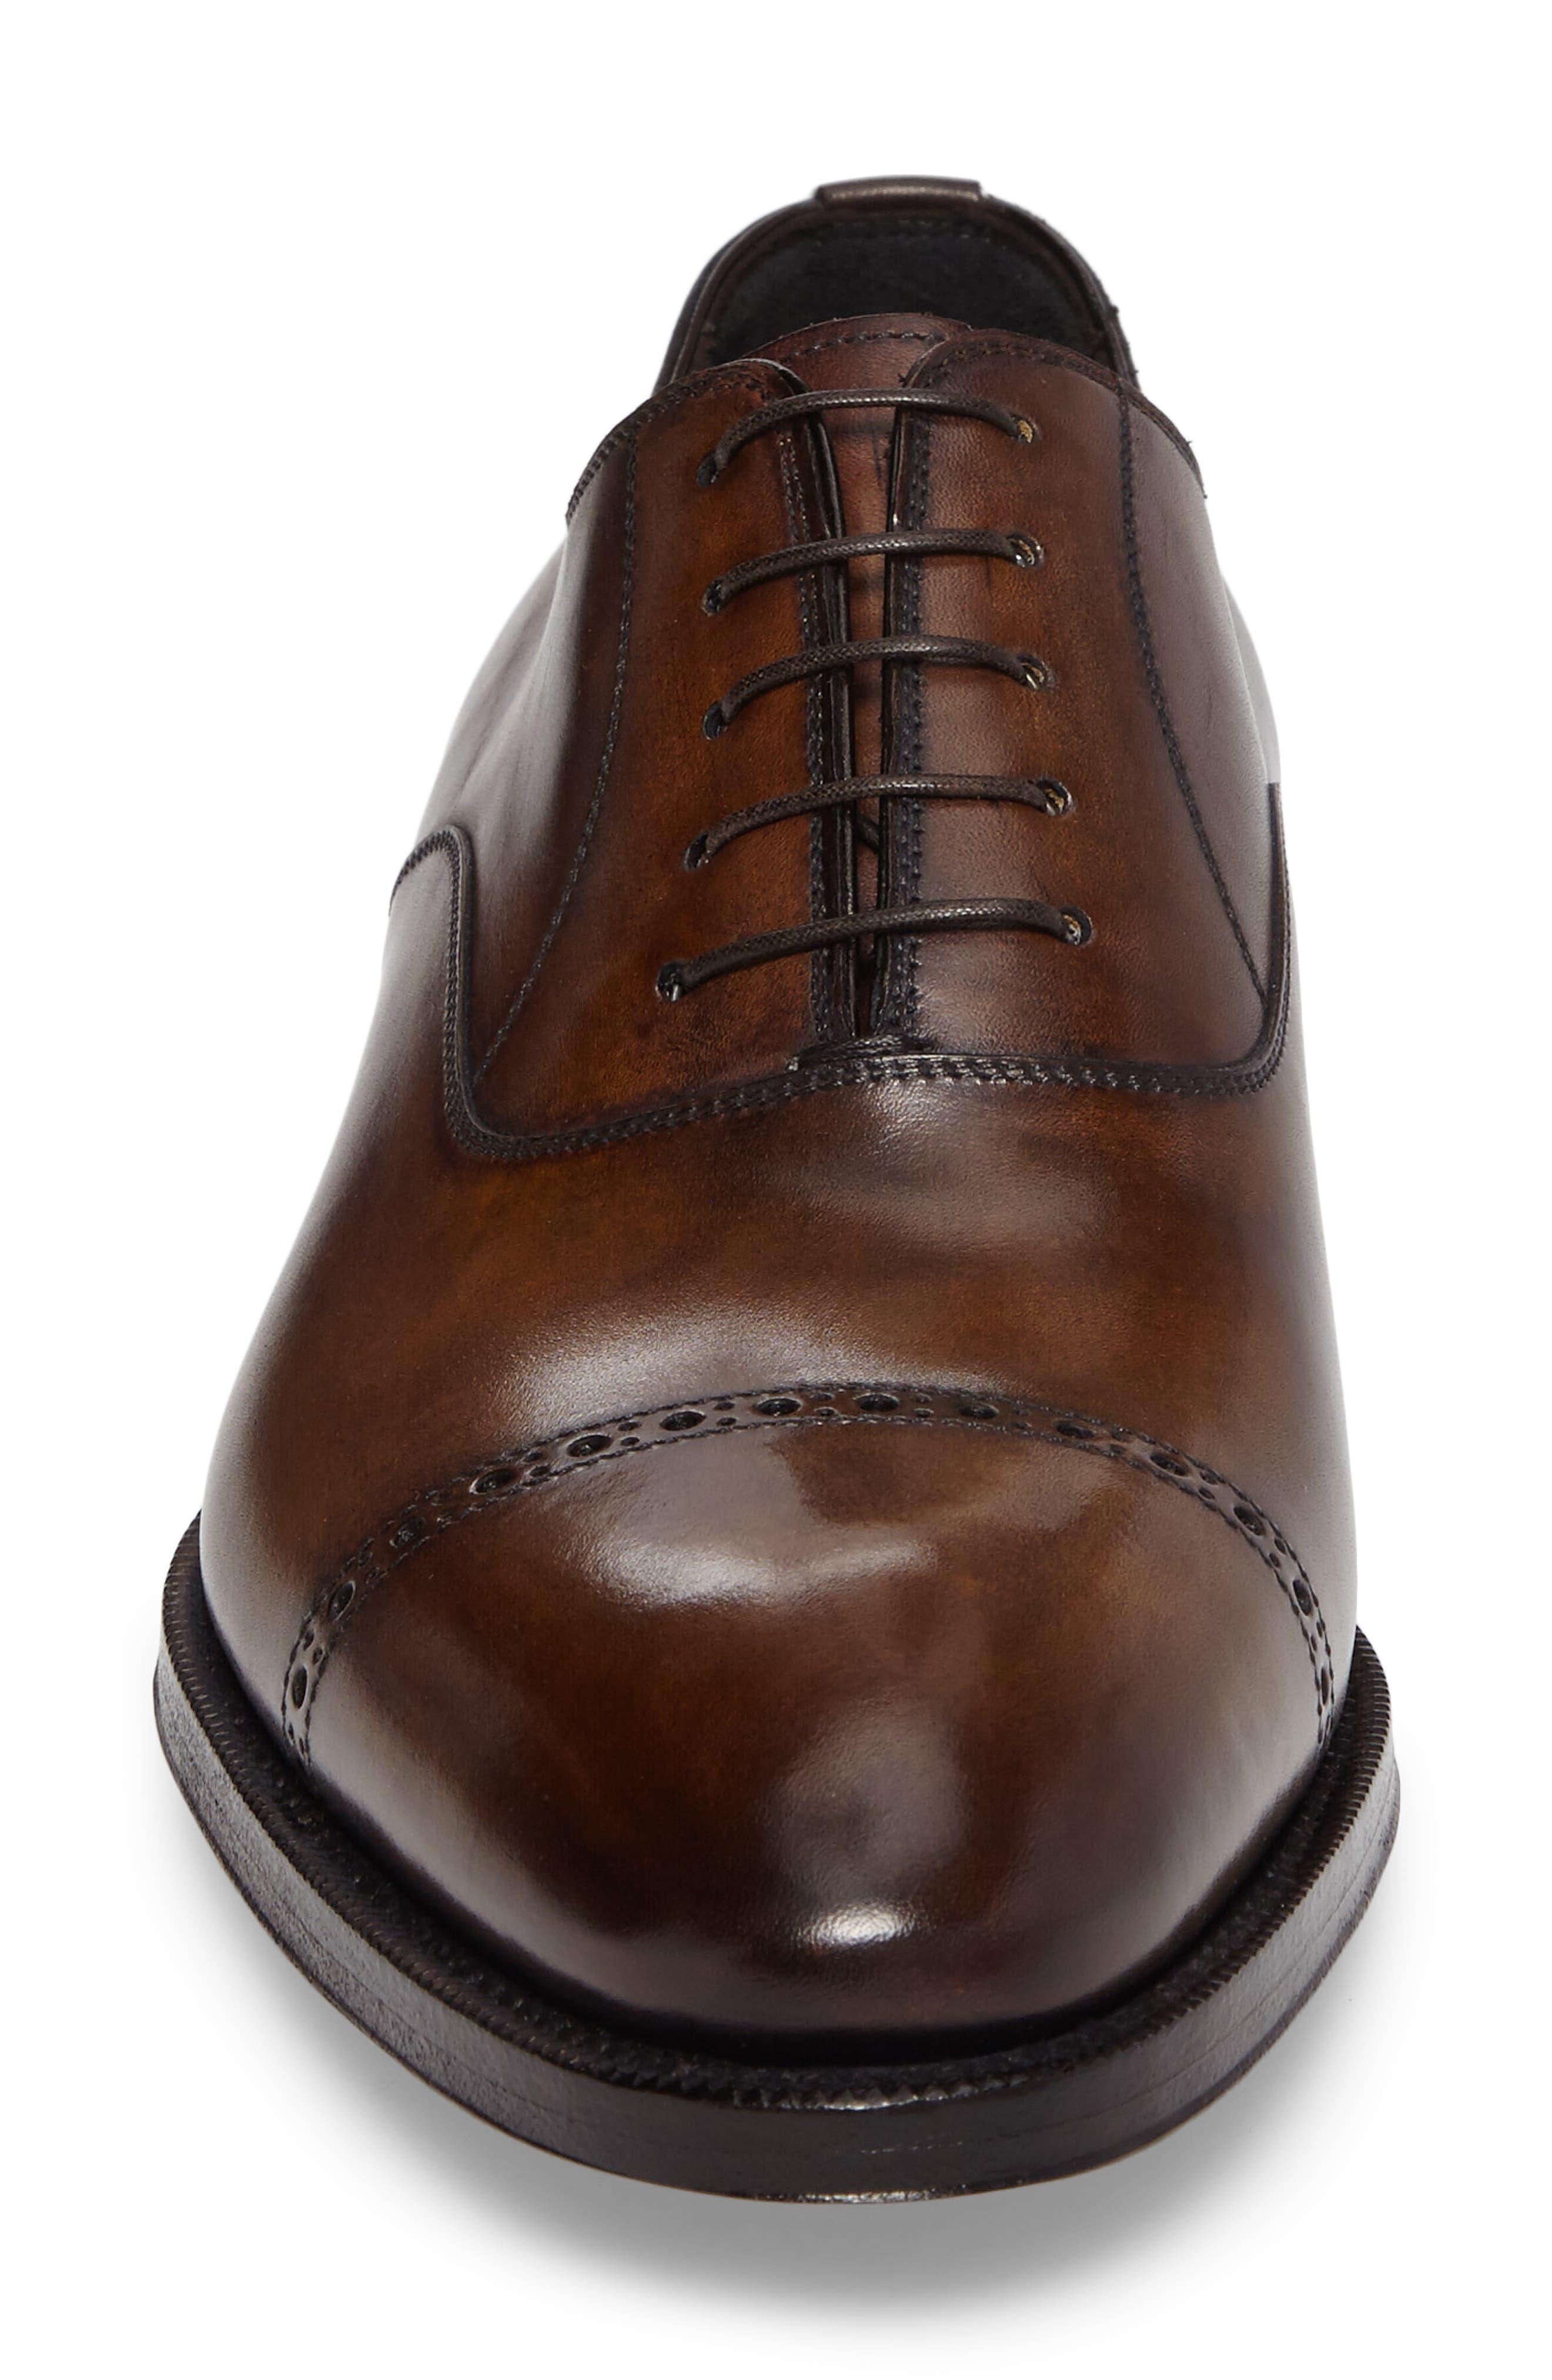 DiGallo Bianco Cap Toe Oxford,                             Alternate thumbnail 4, color,                             Zenzero Leather